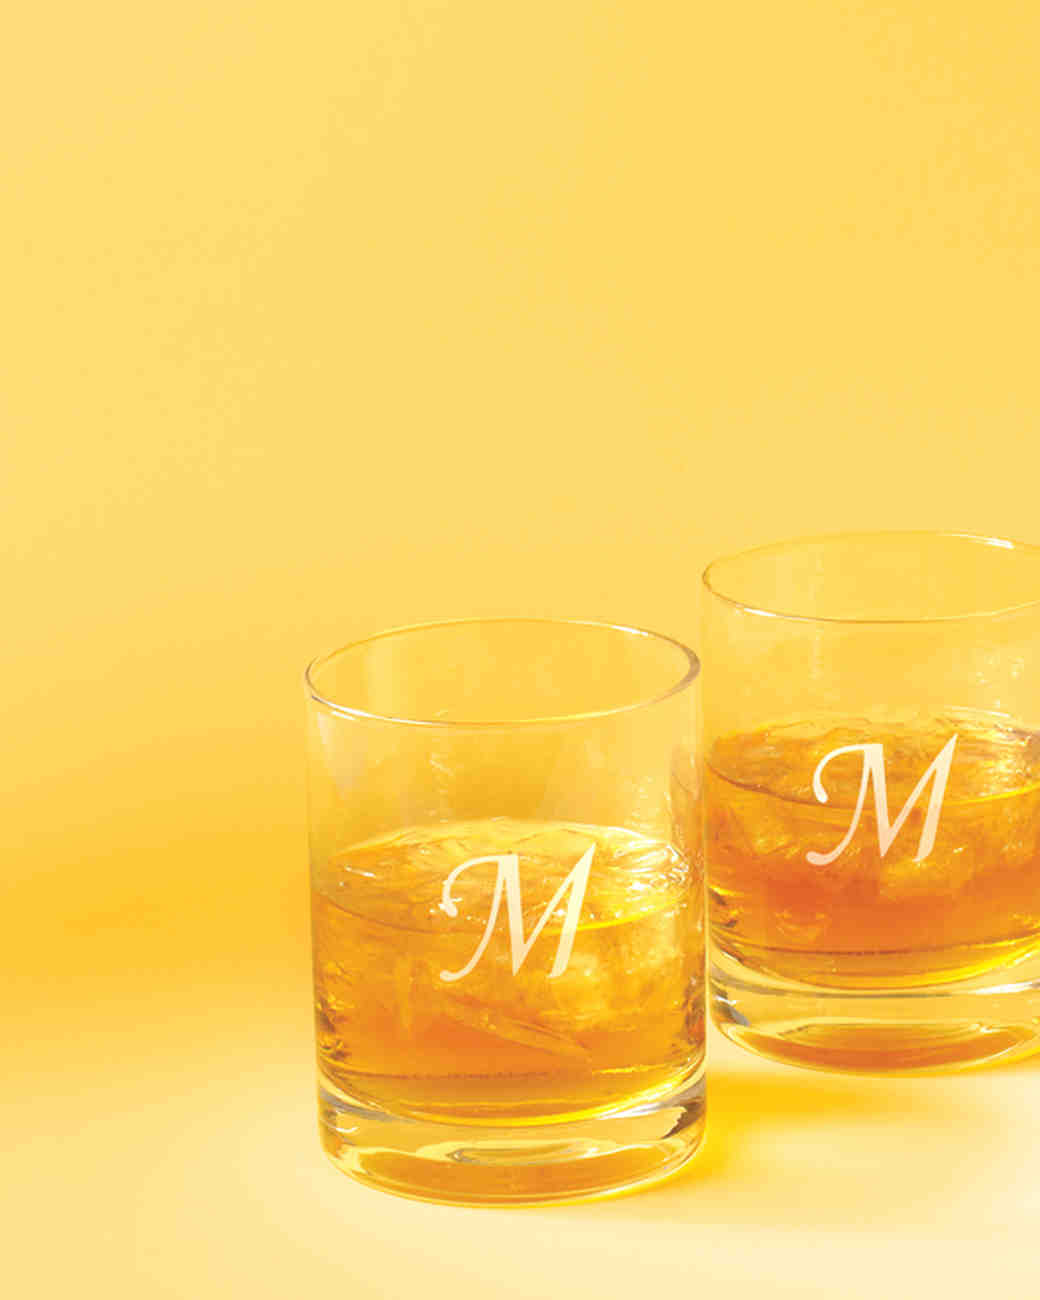 glasses-mwd108538.jpg